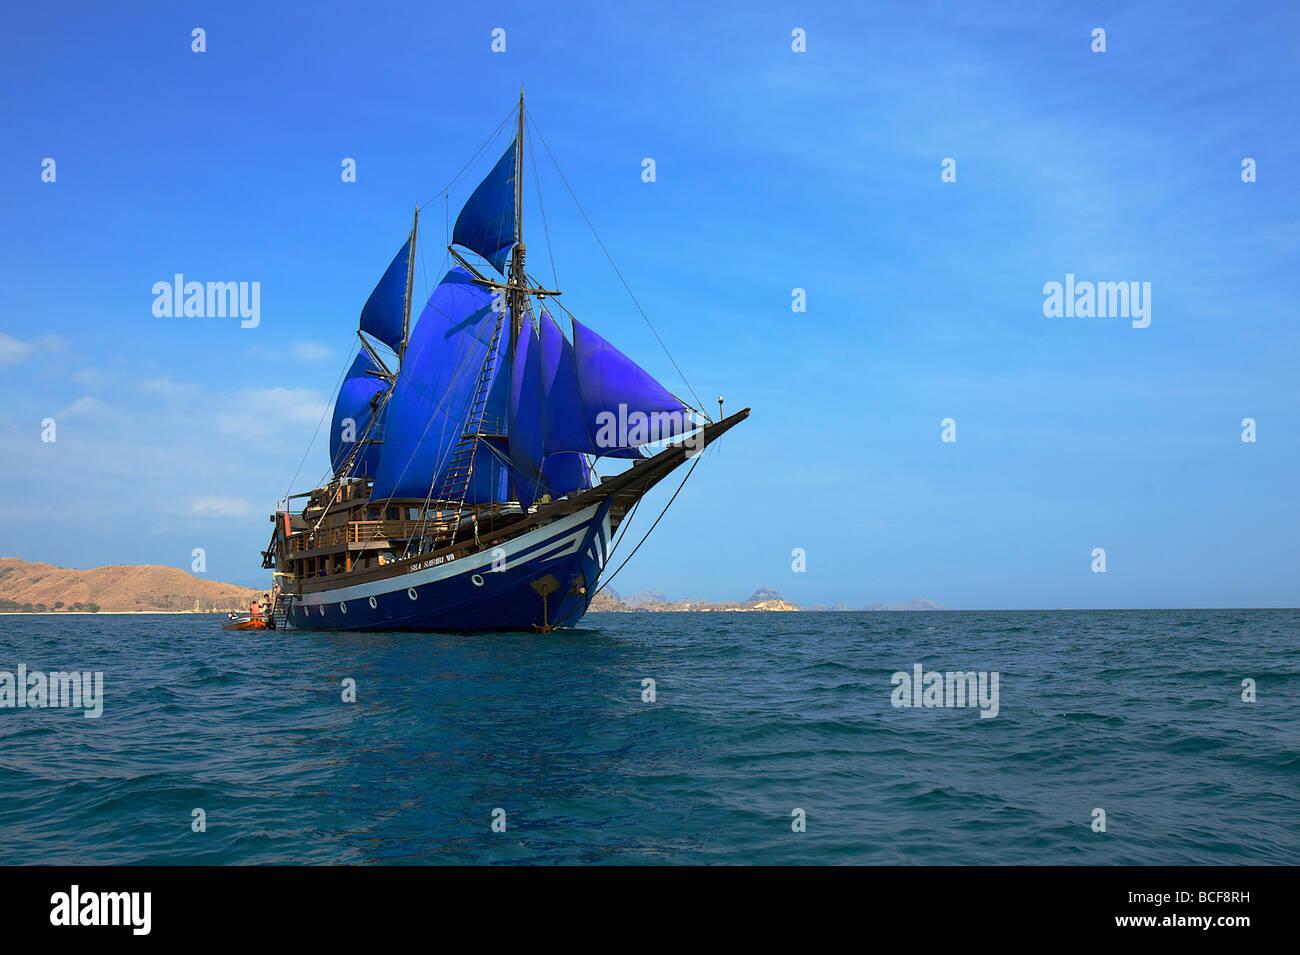 Safari ship, East part of Komodo, Lesser Sunda Islands, Indonesia - Stock Image